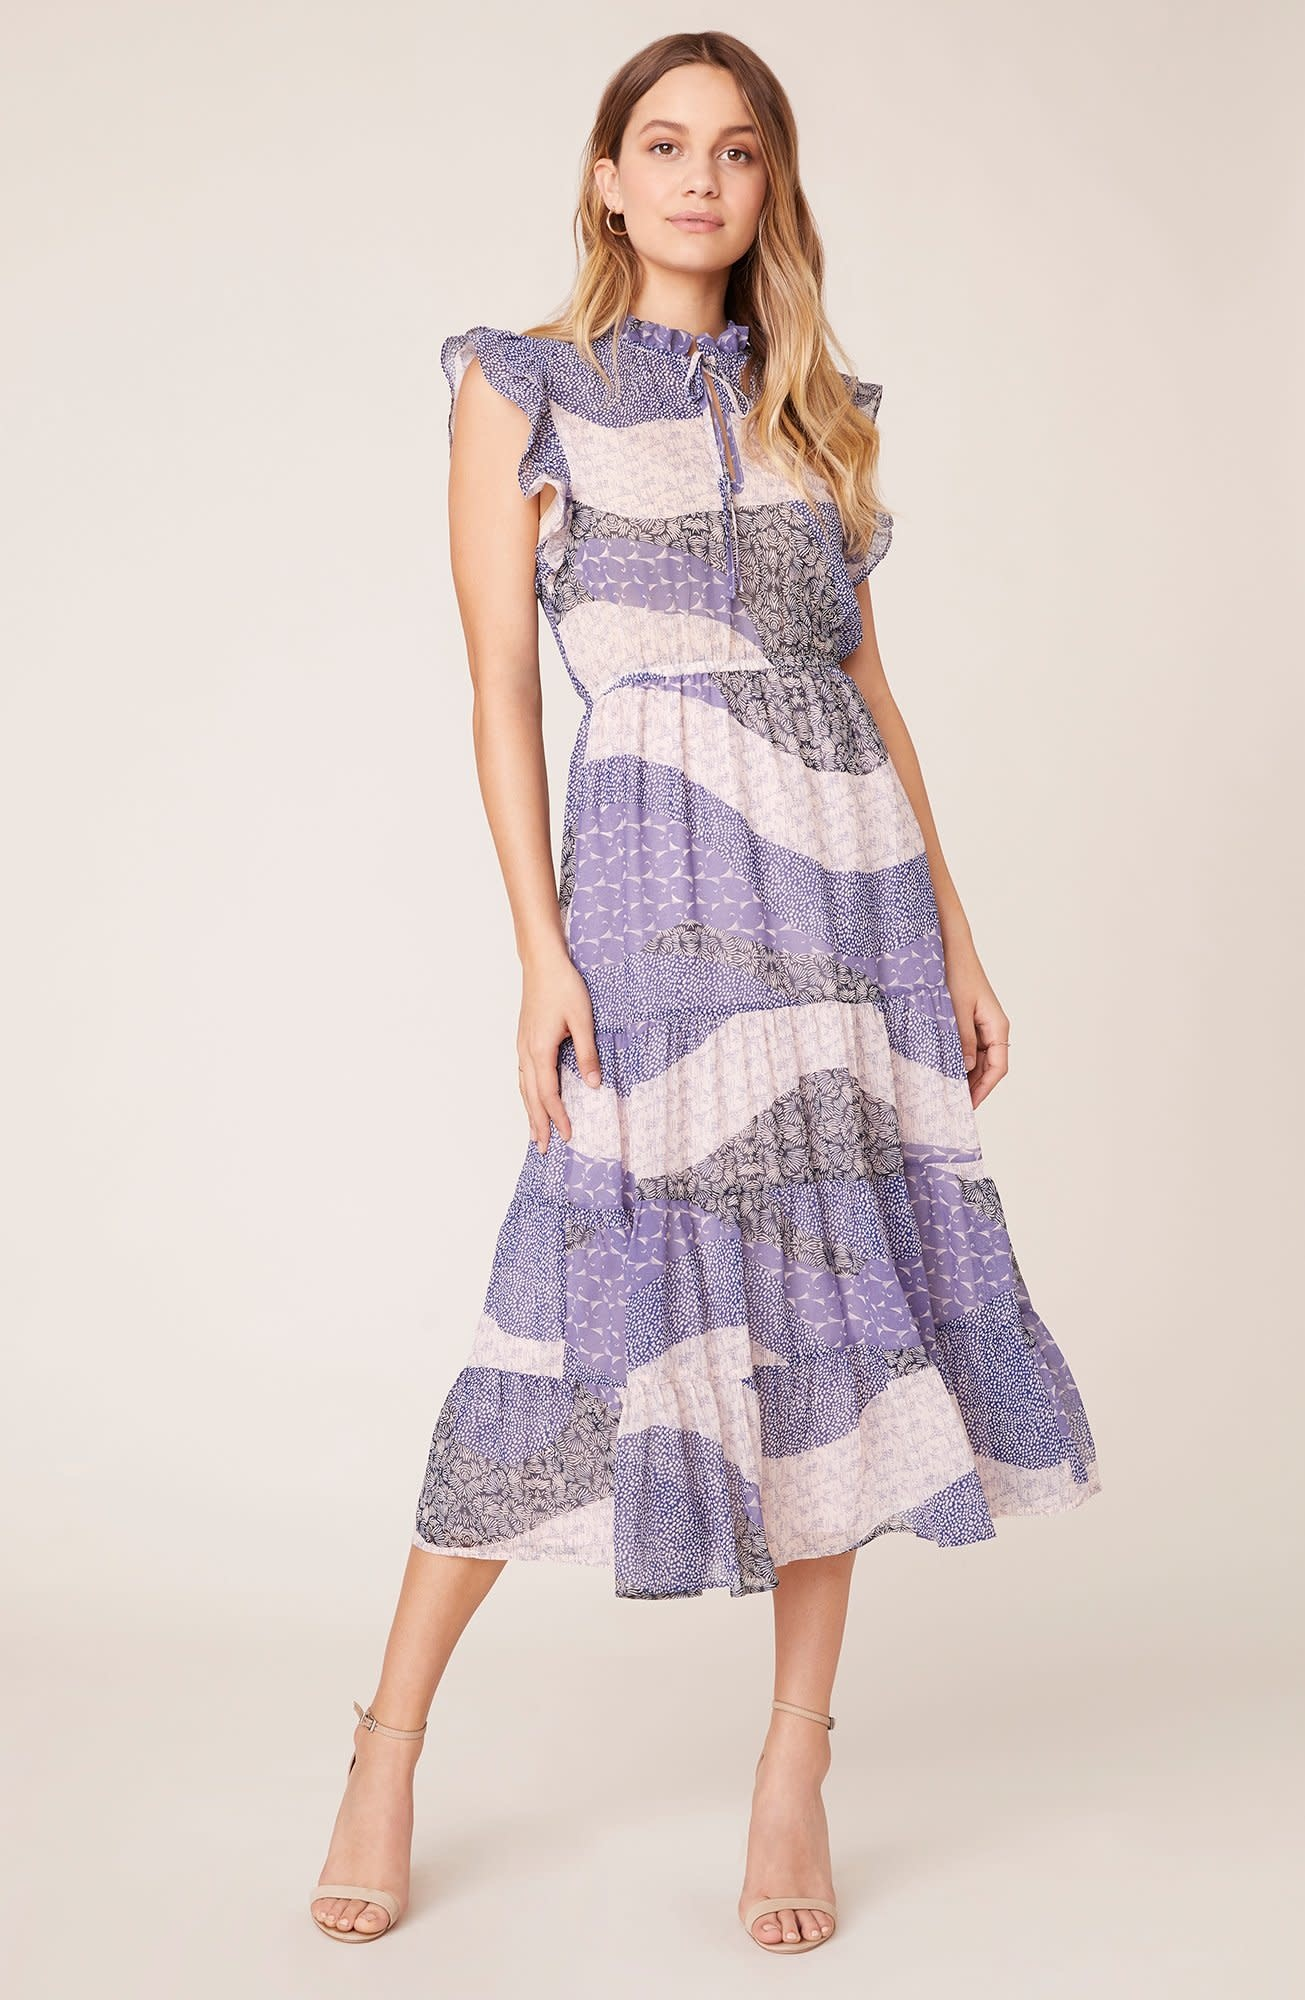 BB Dakota All Mixed Up Lavender Midi Dress